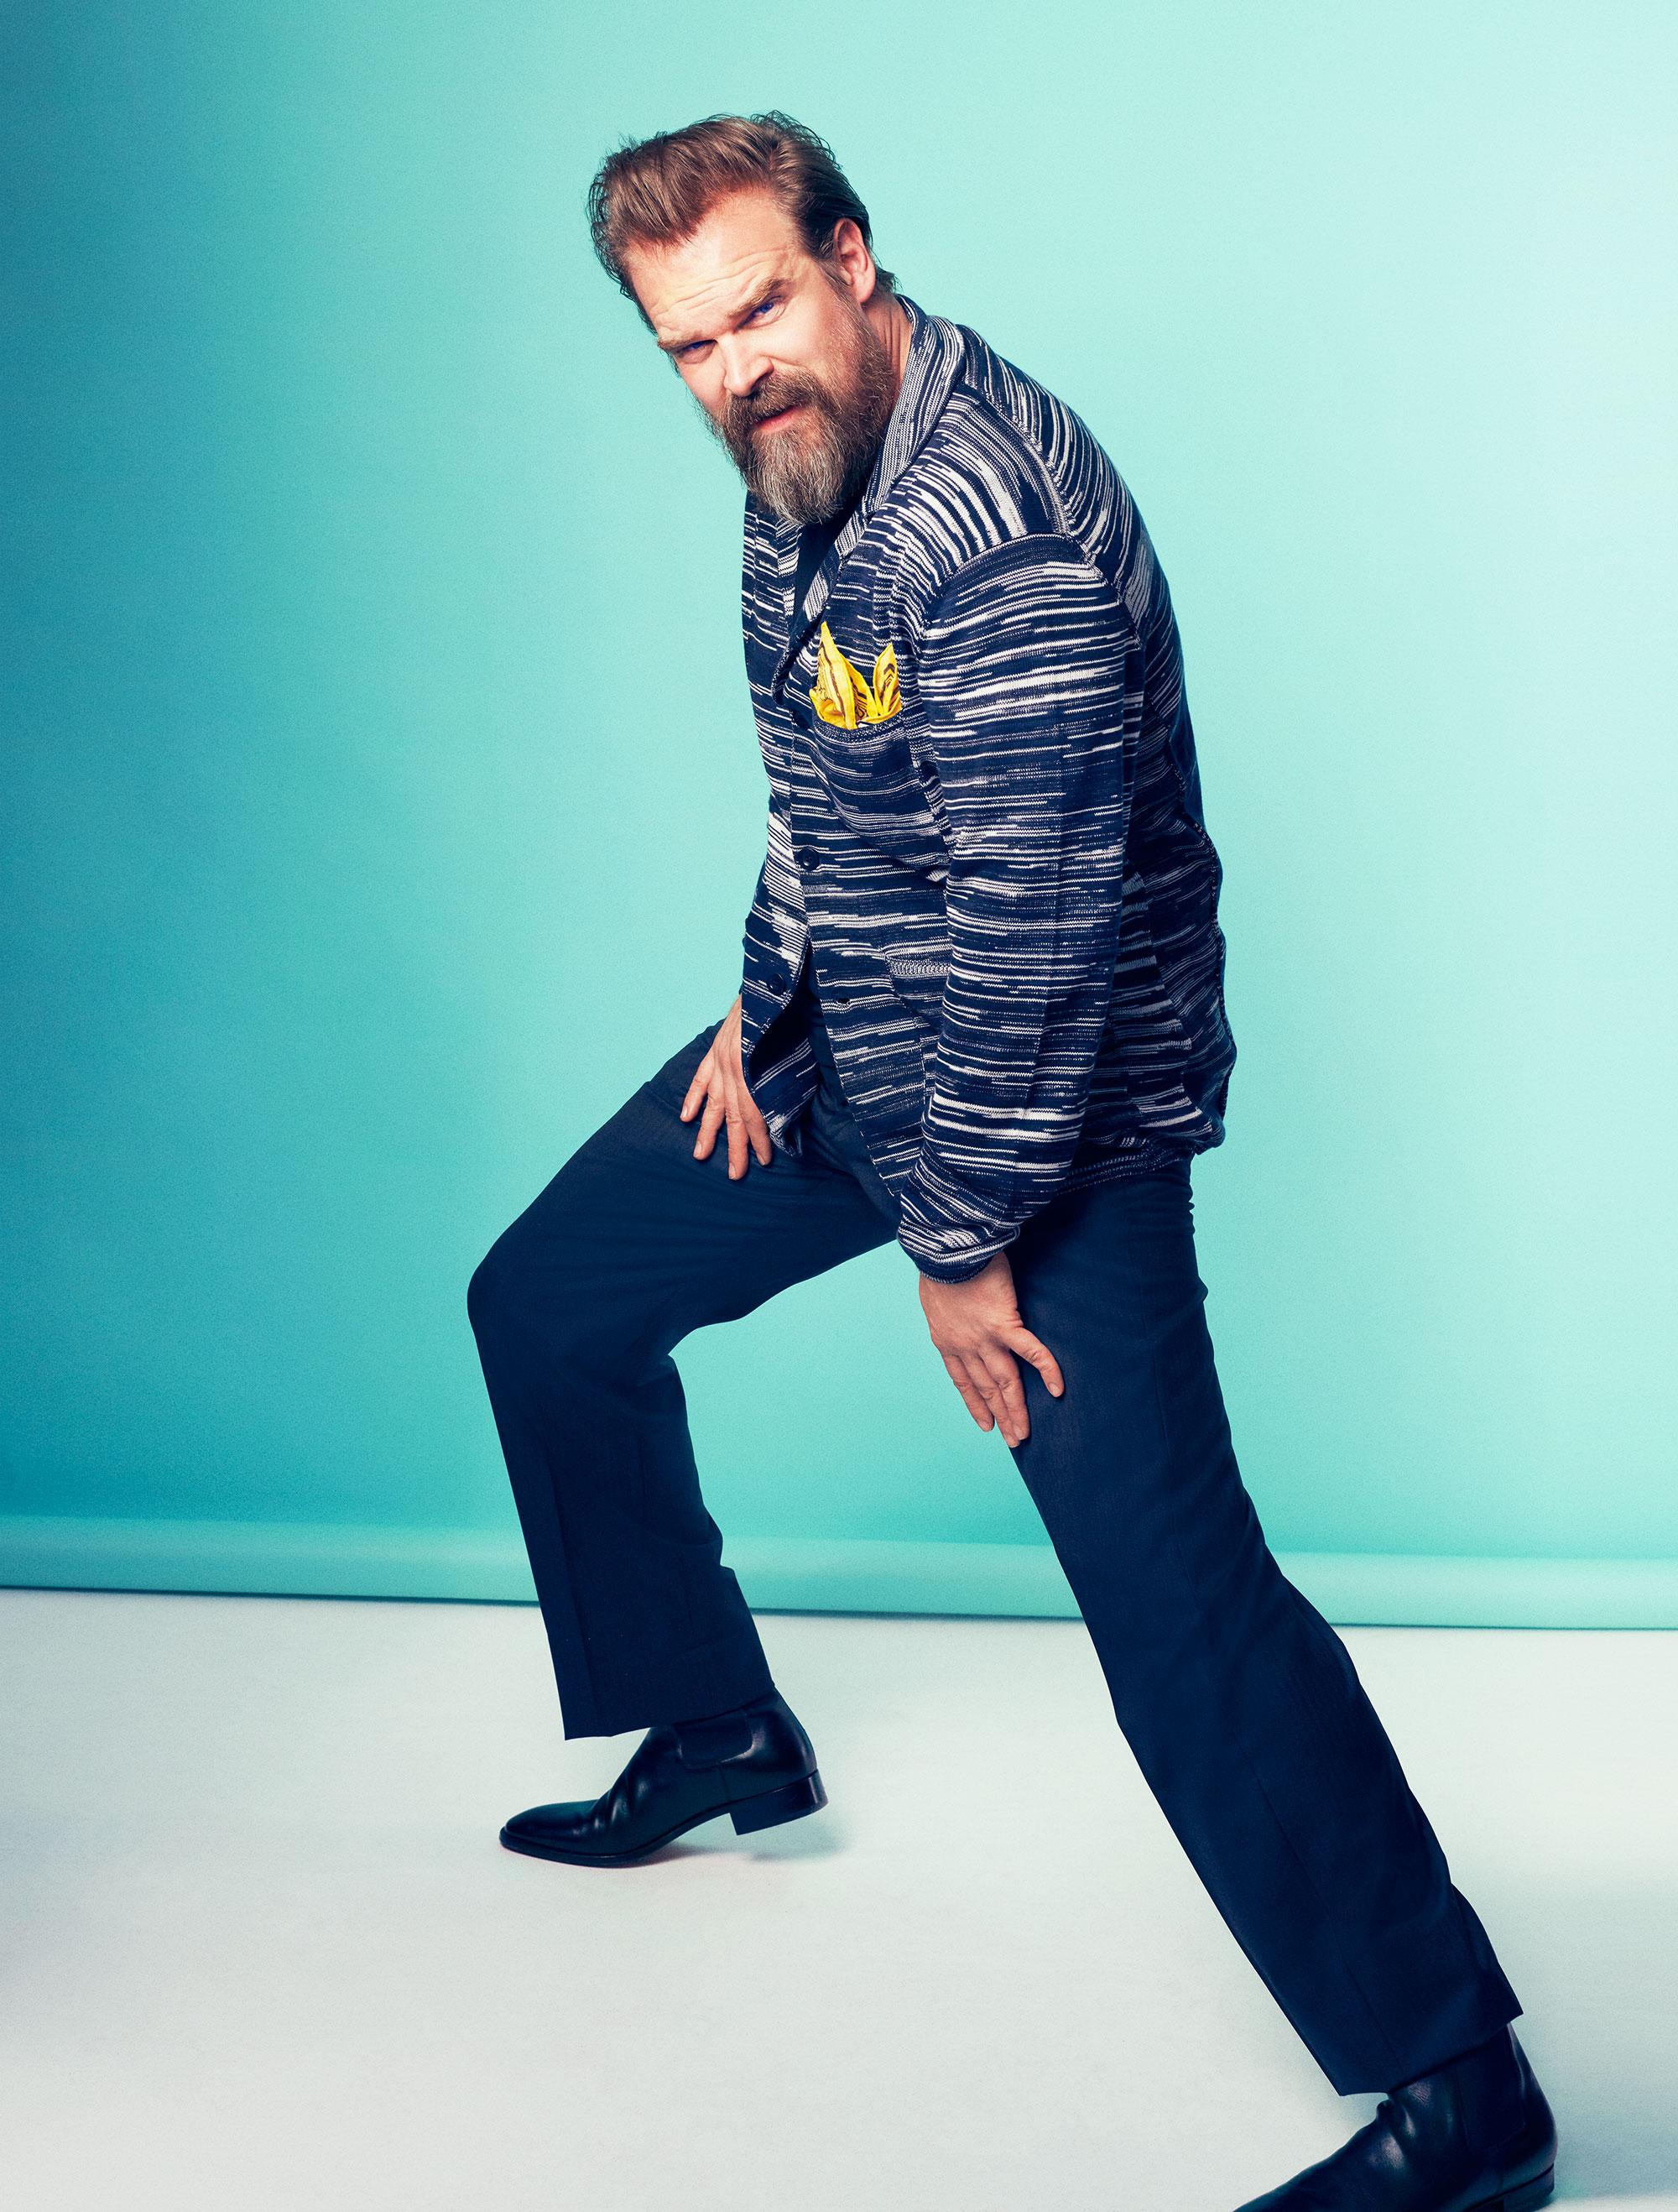 "Пиджак, Missoni;  < br> футболка, Jockey; <br> брюки, Giorgio Armani; <br> ботинки, Christian Louboutin; <br> платок паше, Gucci"" title="